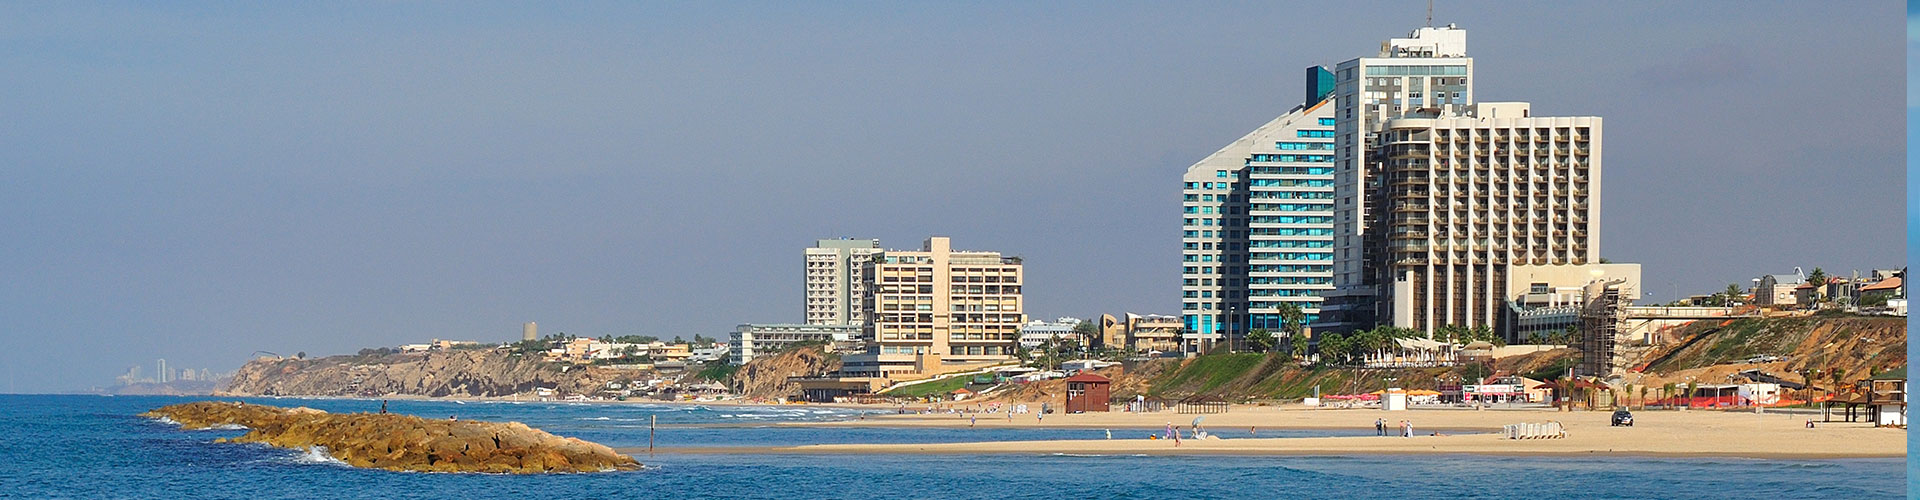 Séjour en hôtel à Herzliya